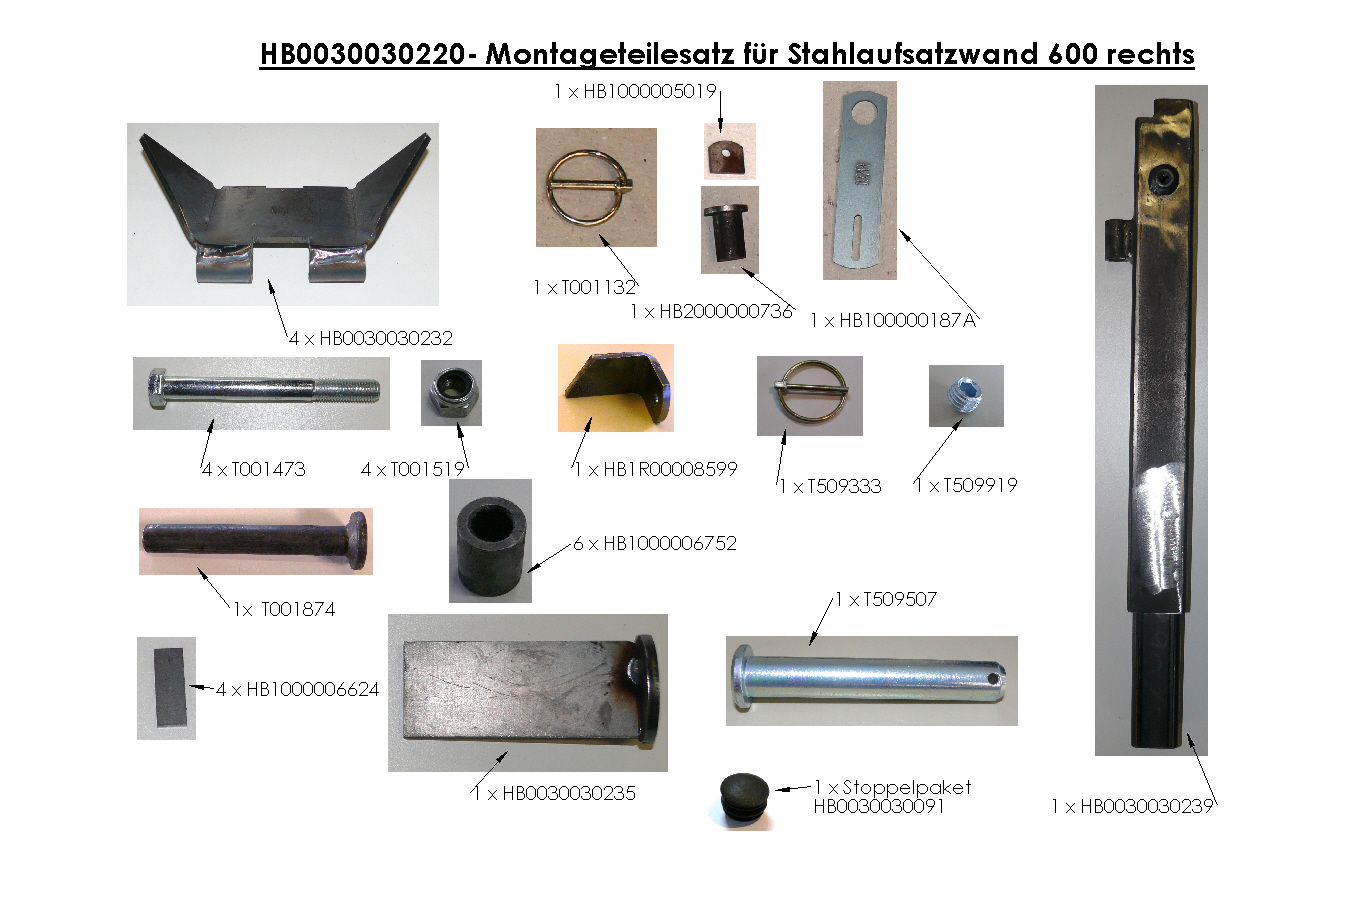 Brantner Kipper und Anhänger - assembly kit for steel attachment wall 600 right